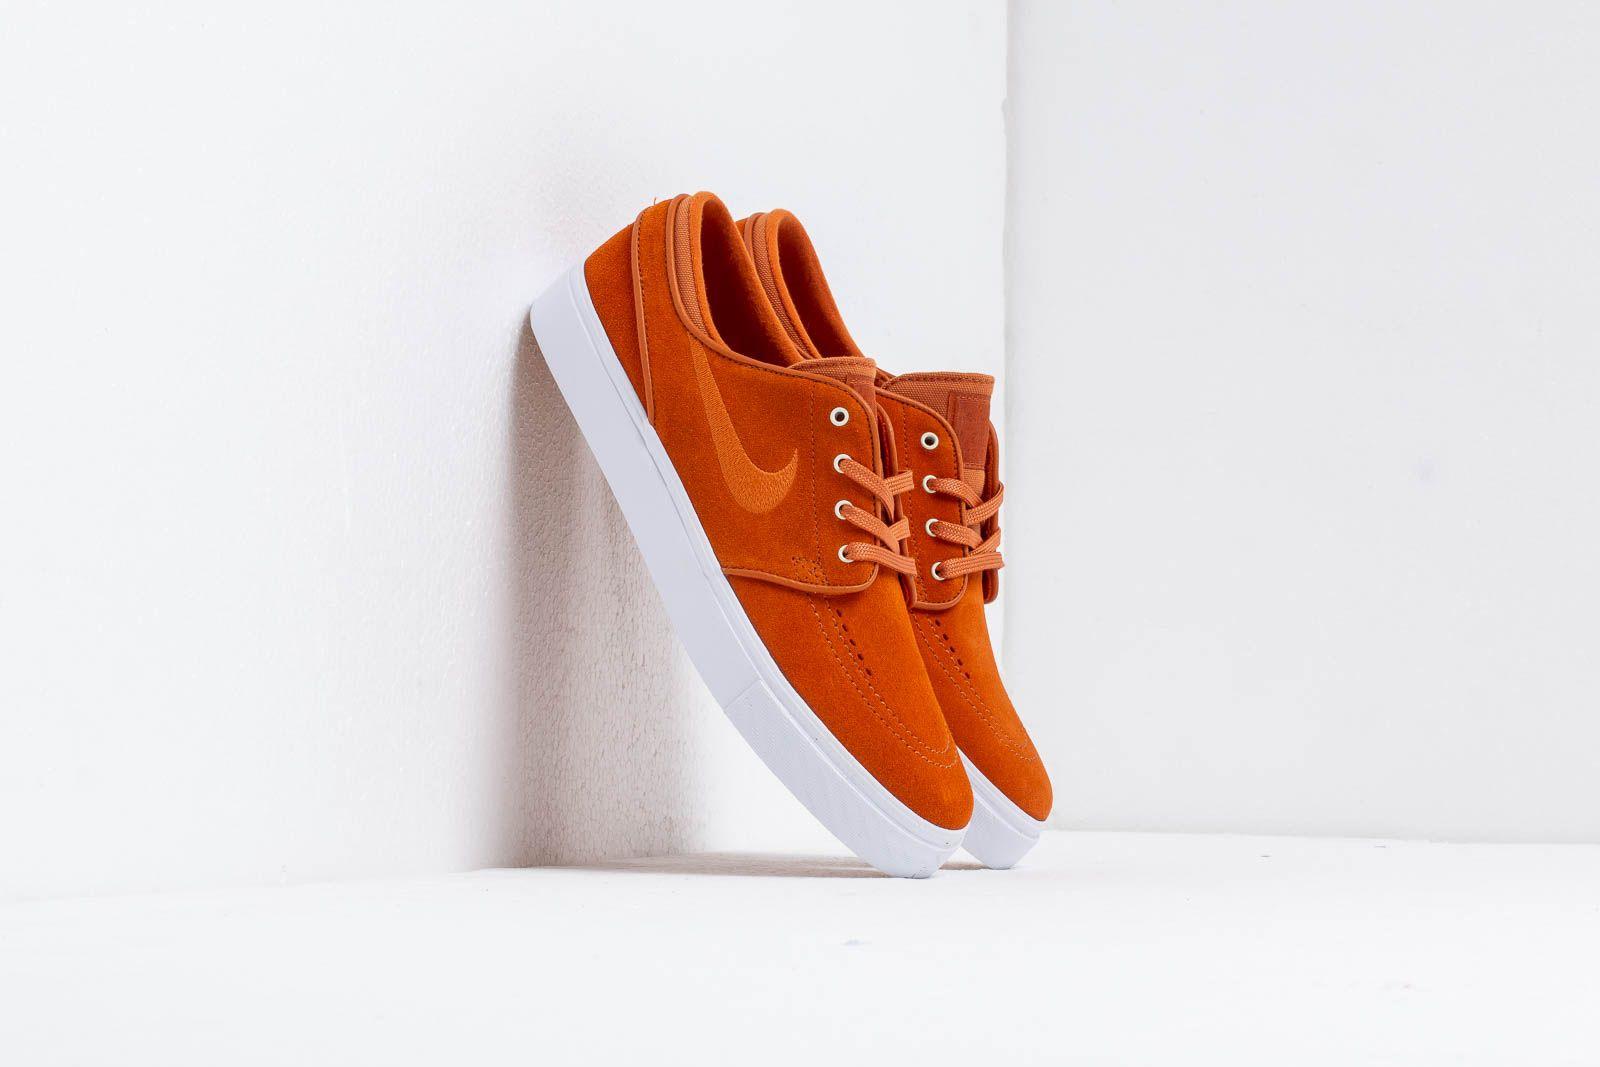 on sale 993c3 4753d Nike Zoom Stefan Janoski Cinder Orange  Cinder Orange-White at a great  price 81